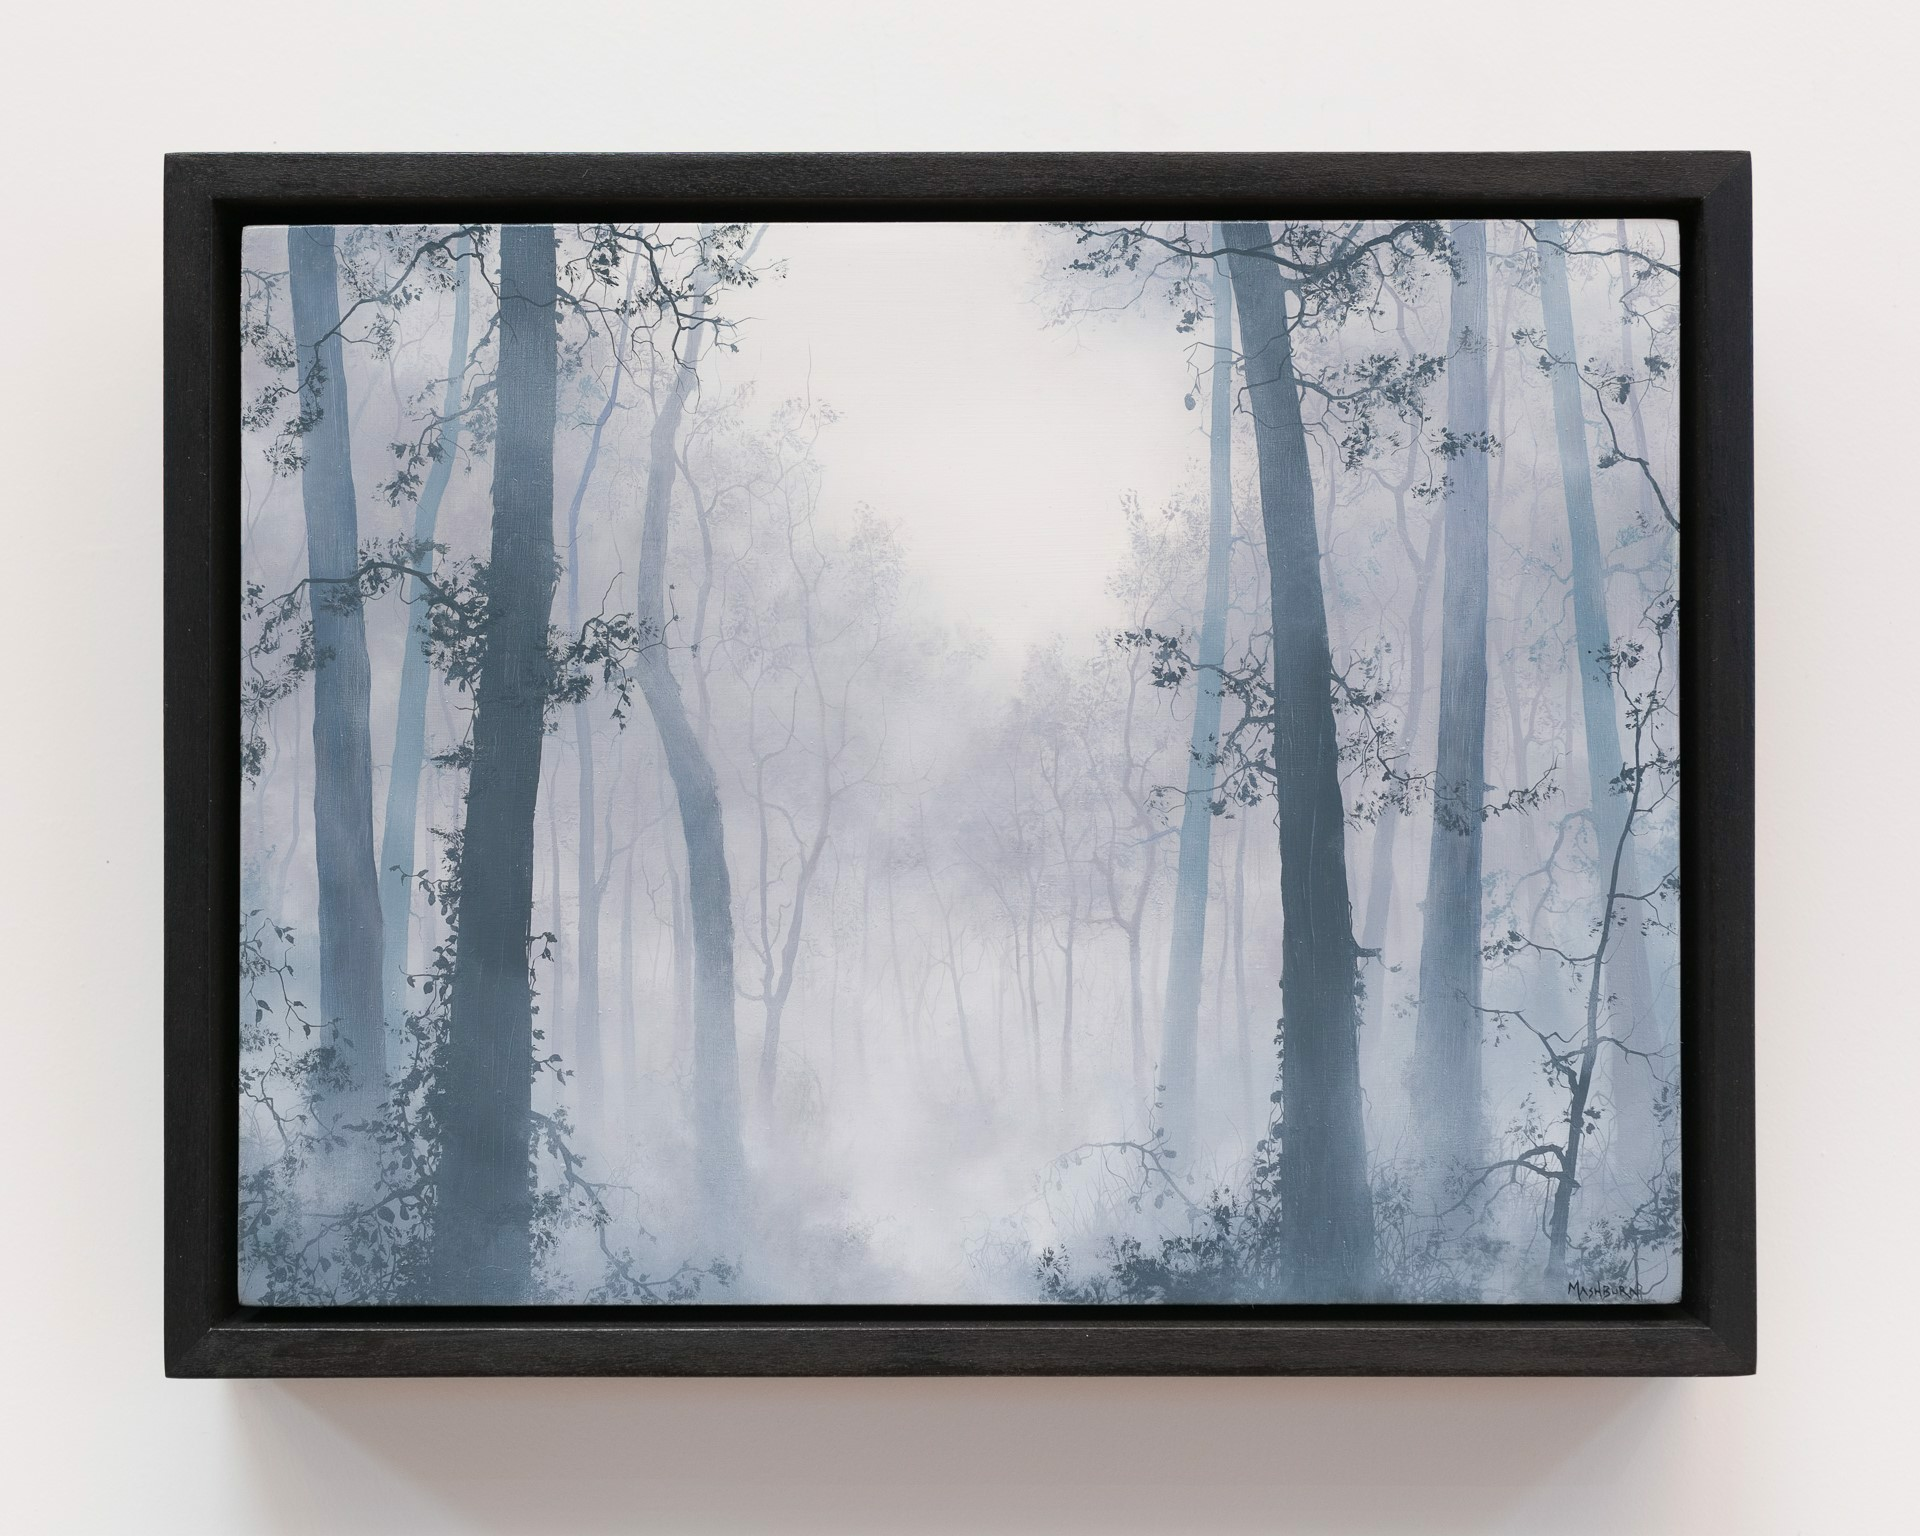 Veil by Brian Mashburn